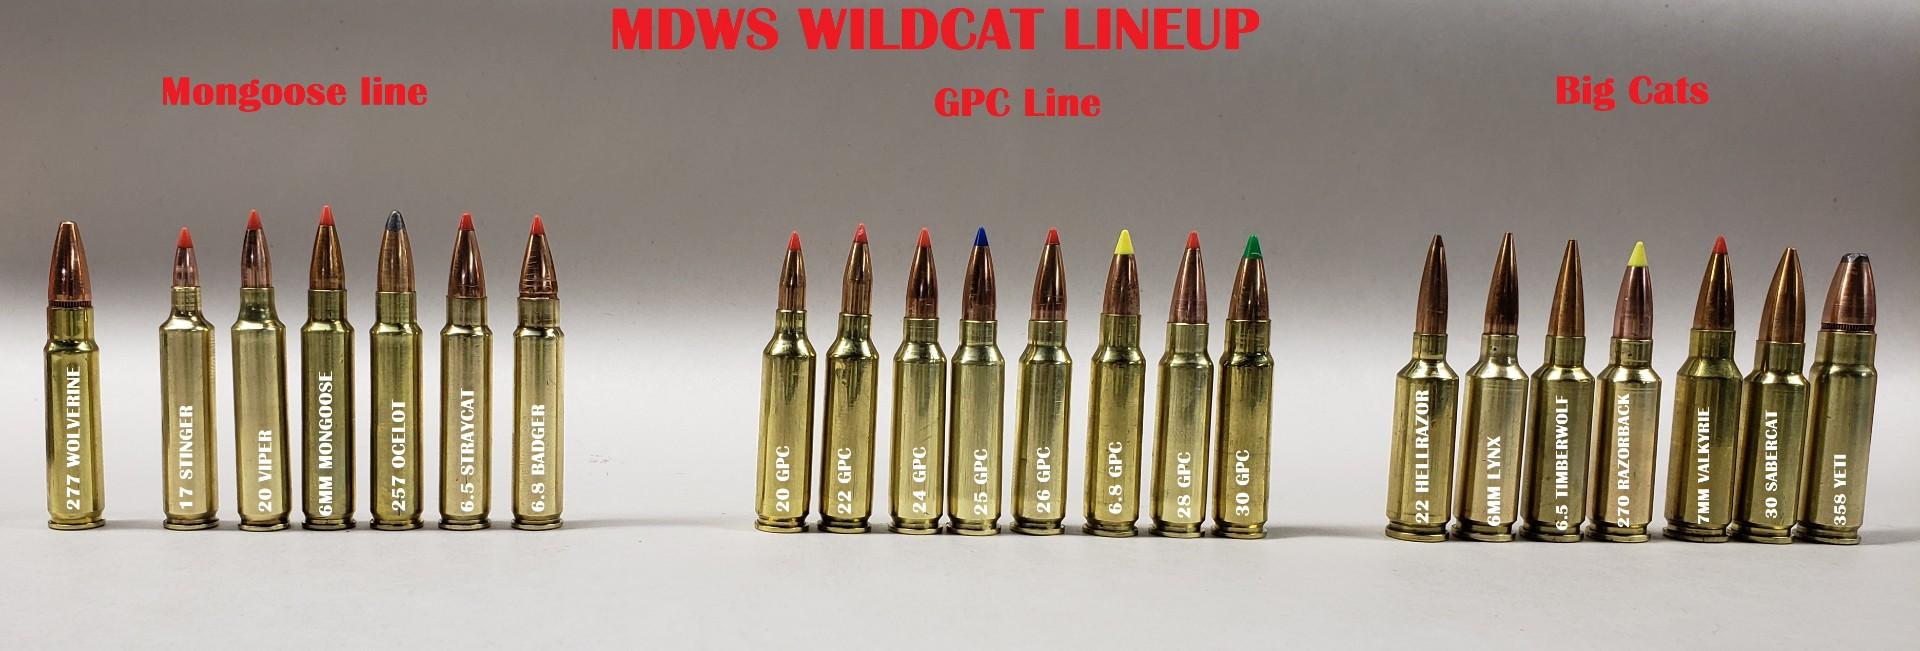 MDWD CAT LINEUP 2.jpg